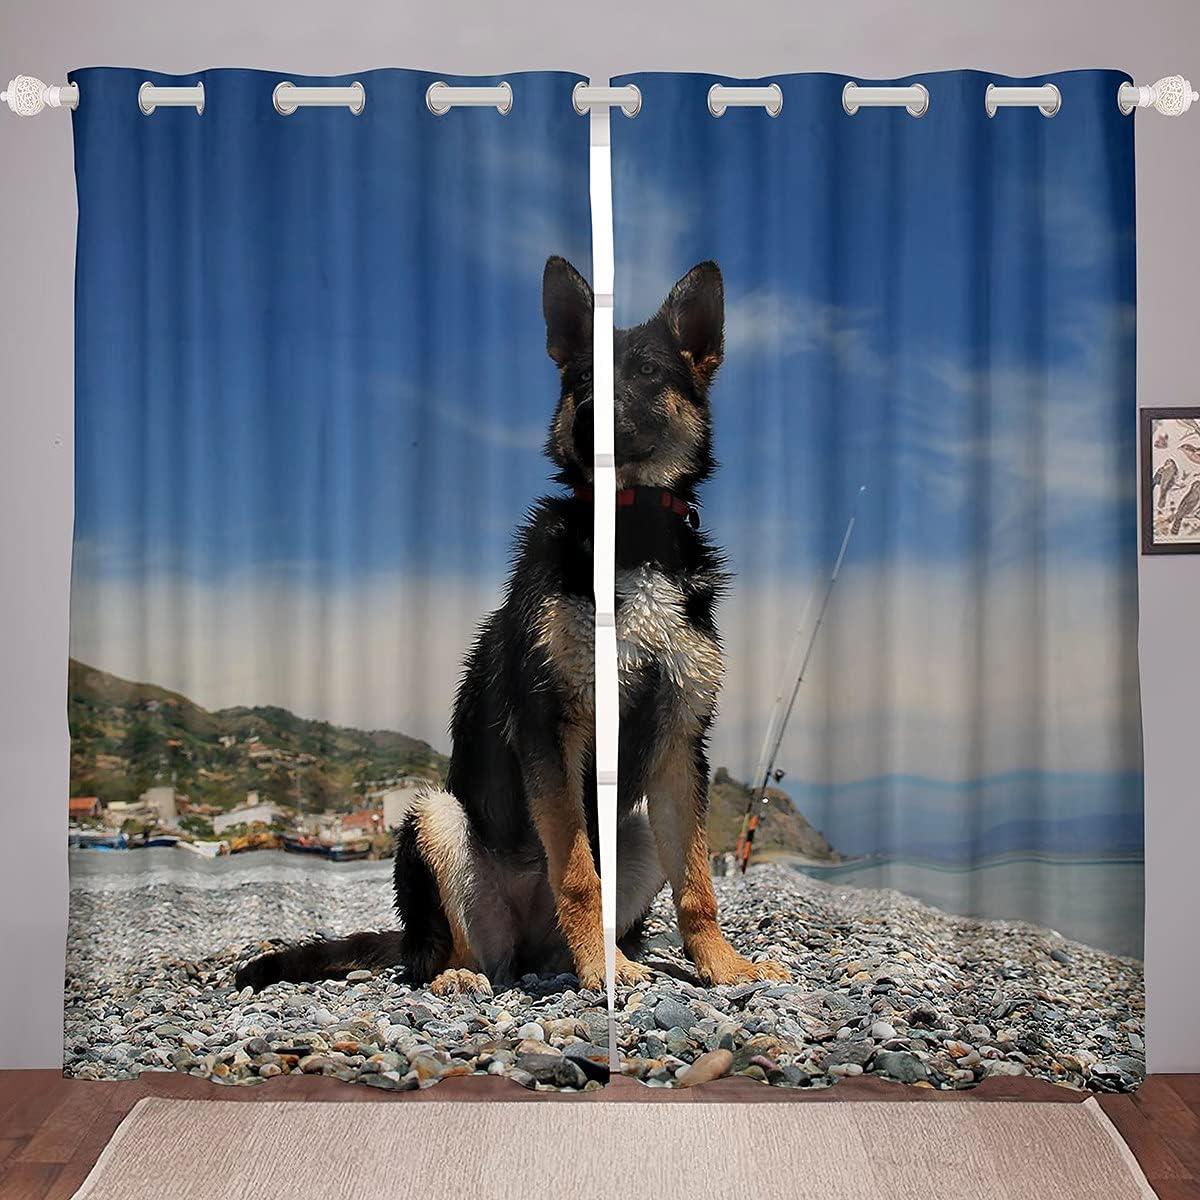 Erosebridal German Shepherd Window Popular product Curtains Kids Boys New product type Teens for